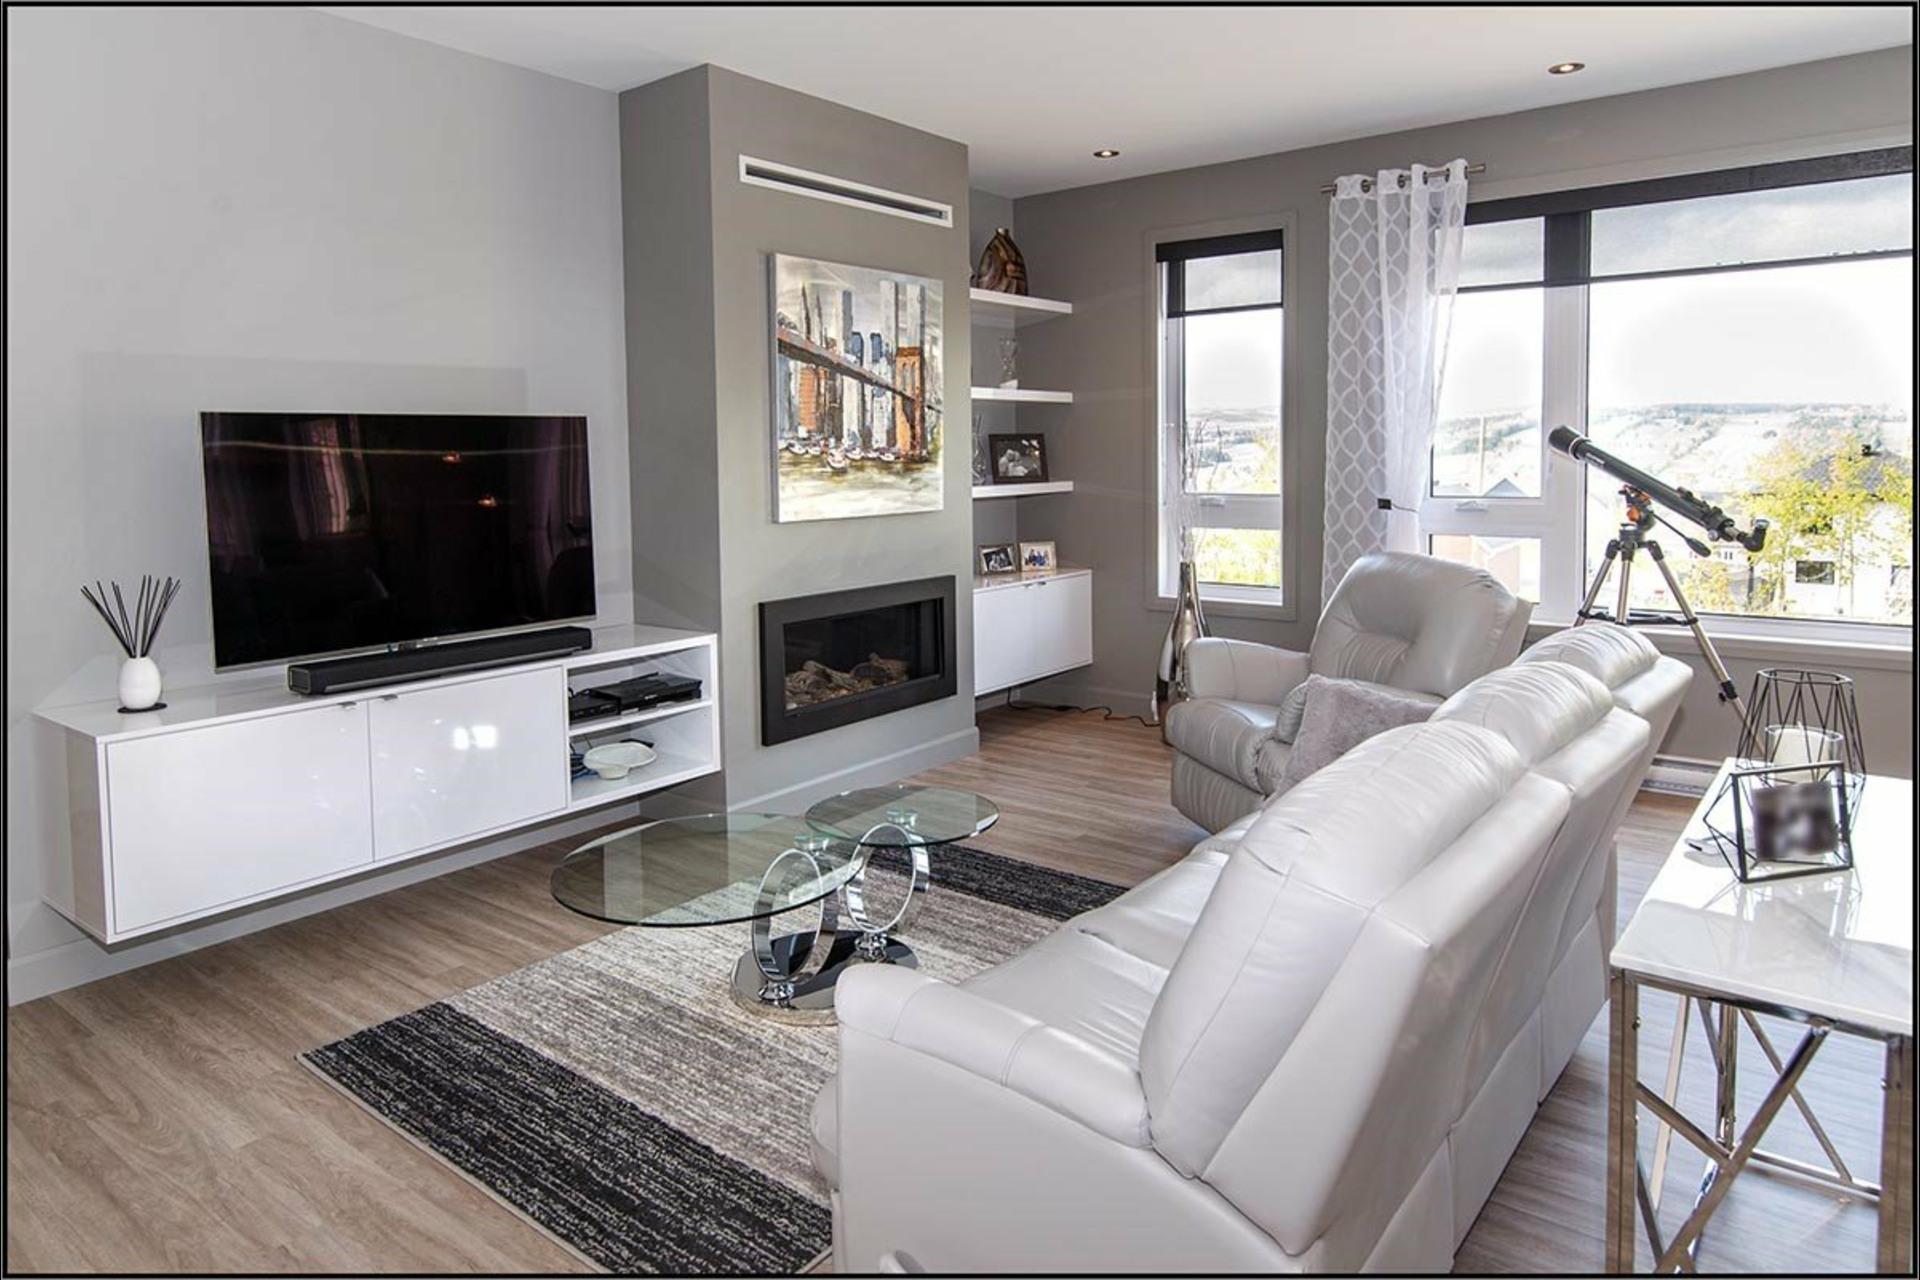 image 5 - Apartment For sale Sainte-Marie - 9 rooms